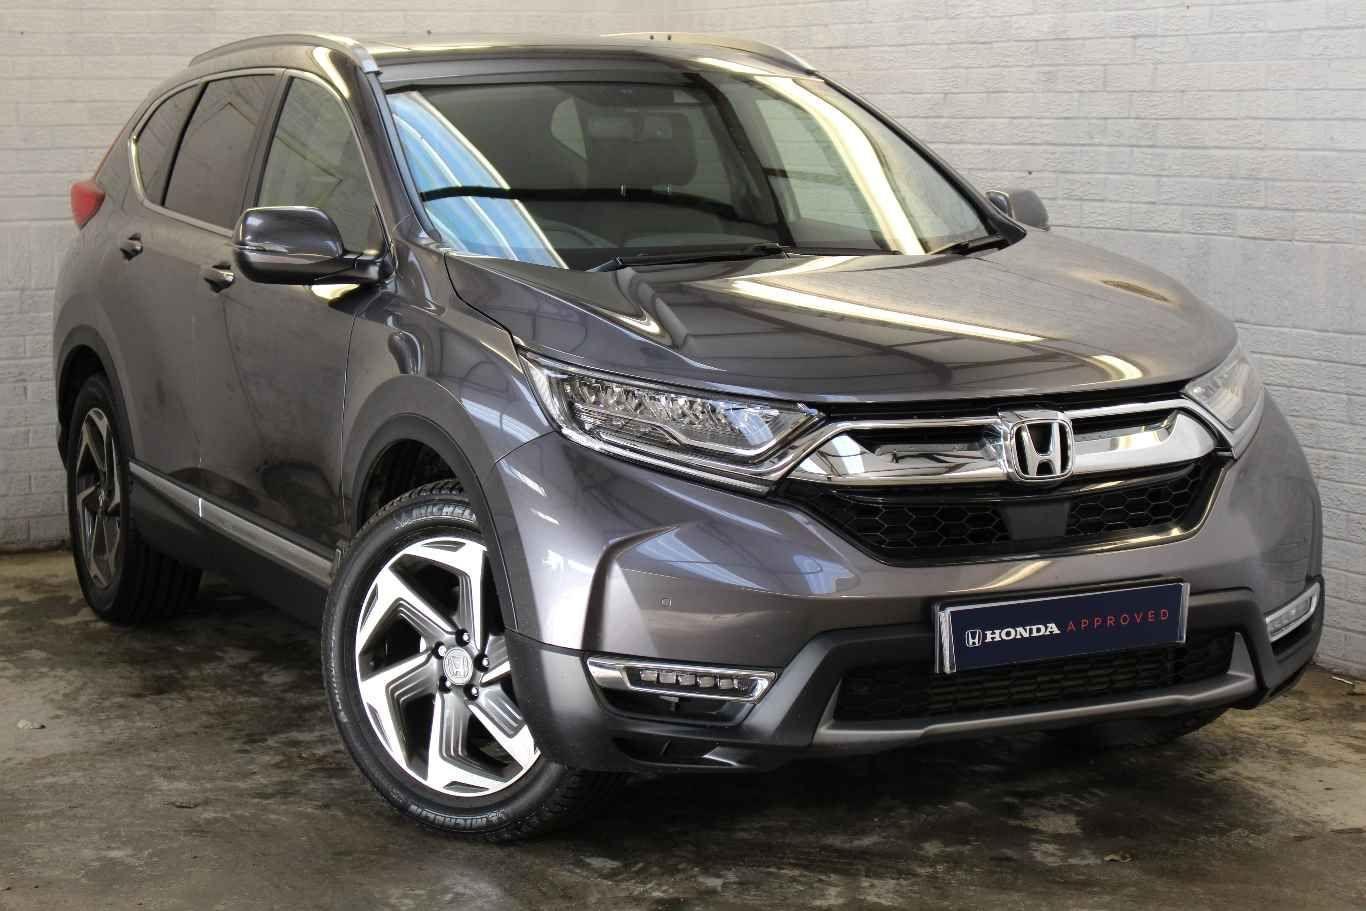 Honda CR-V 1.5 VTEC Turbo EX CVT